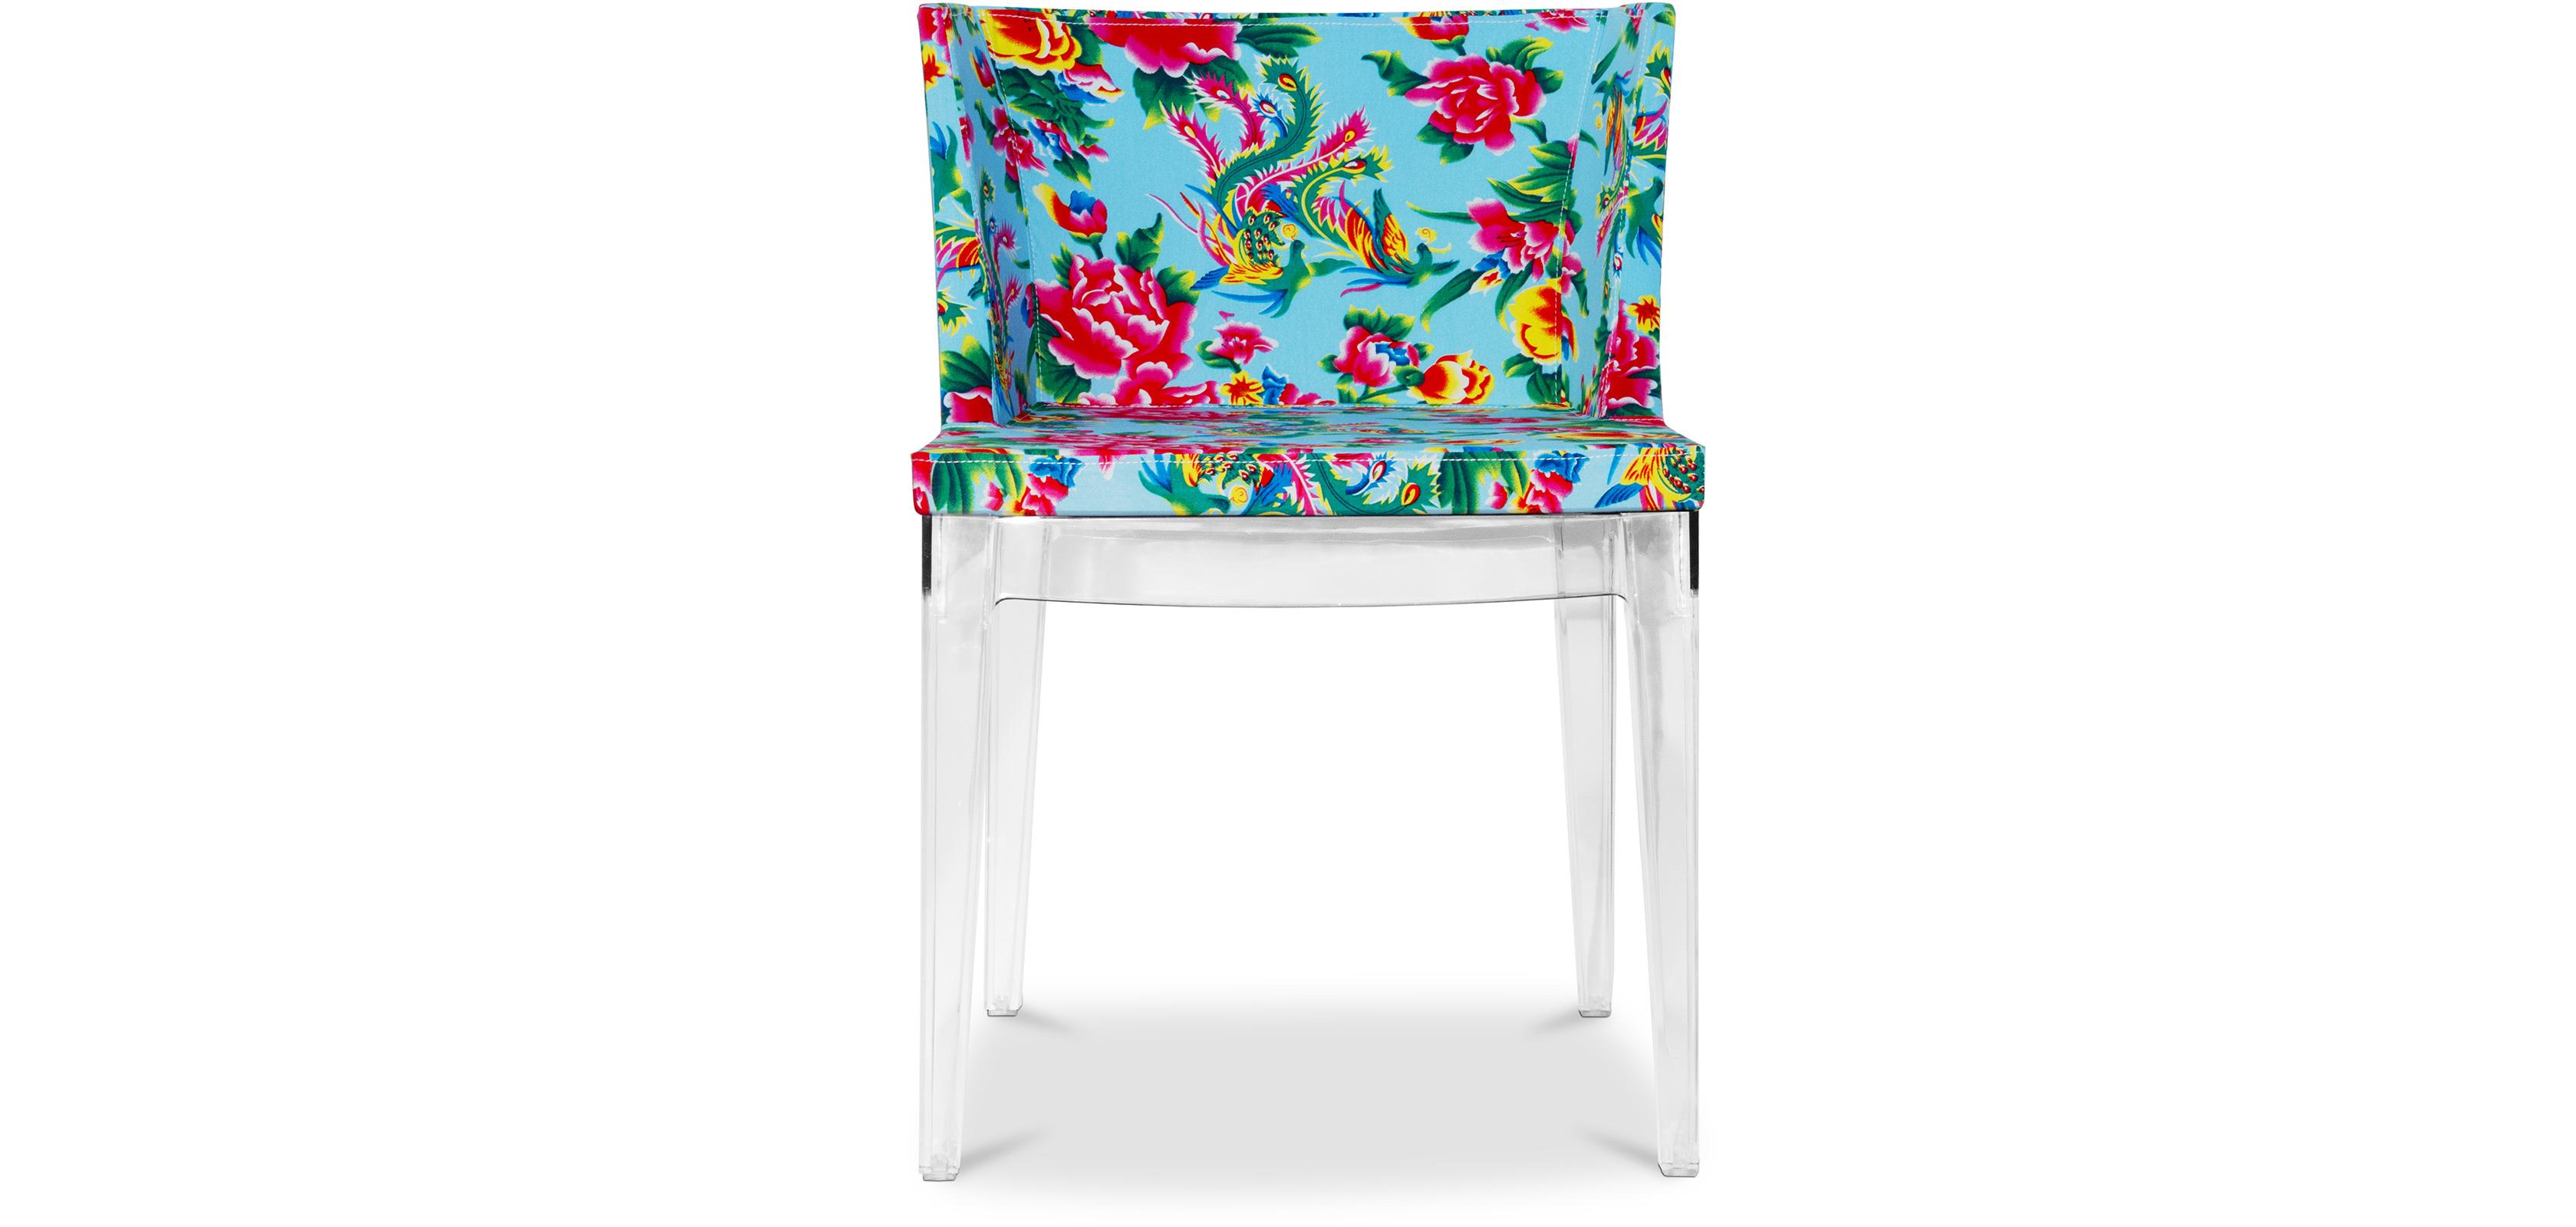 mademoiselle chair philippe starck